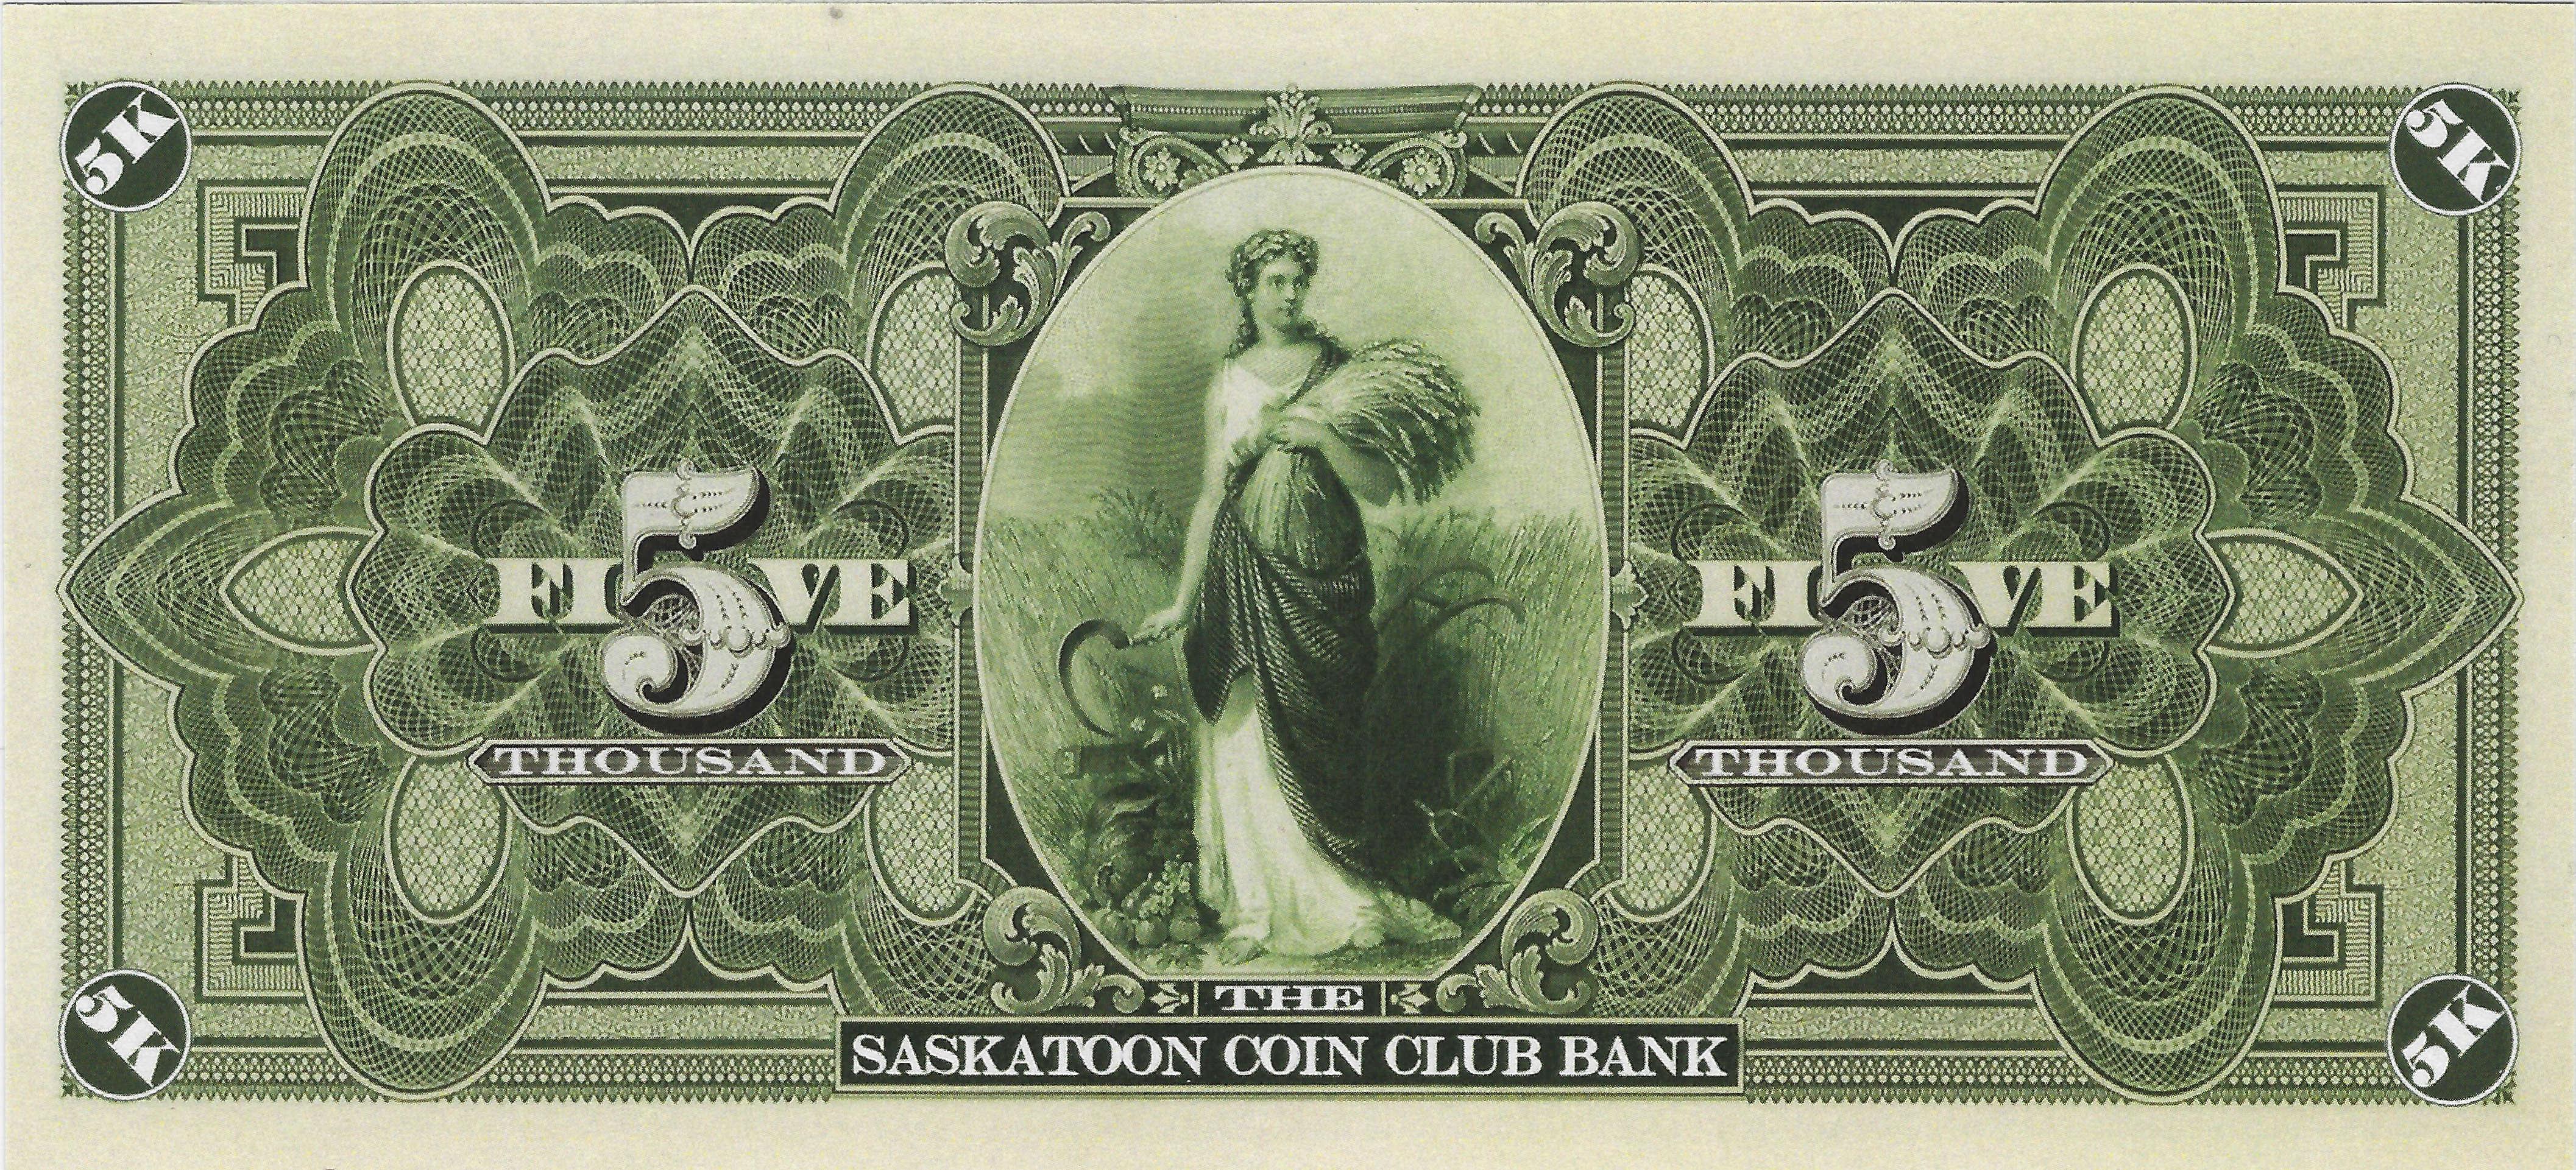 hub city coins saskatoon